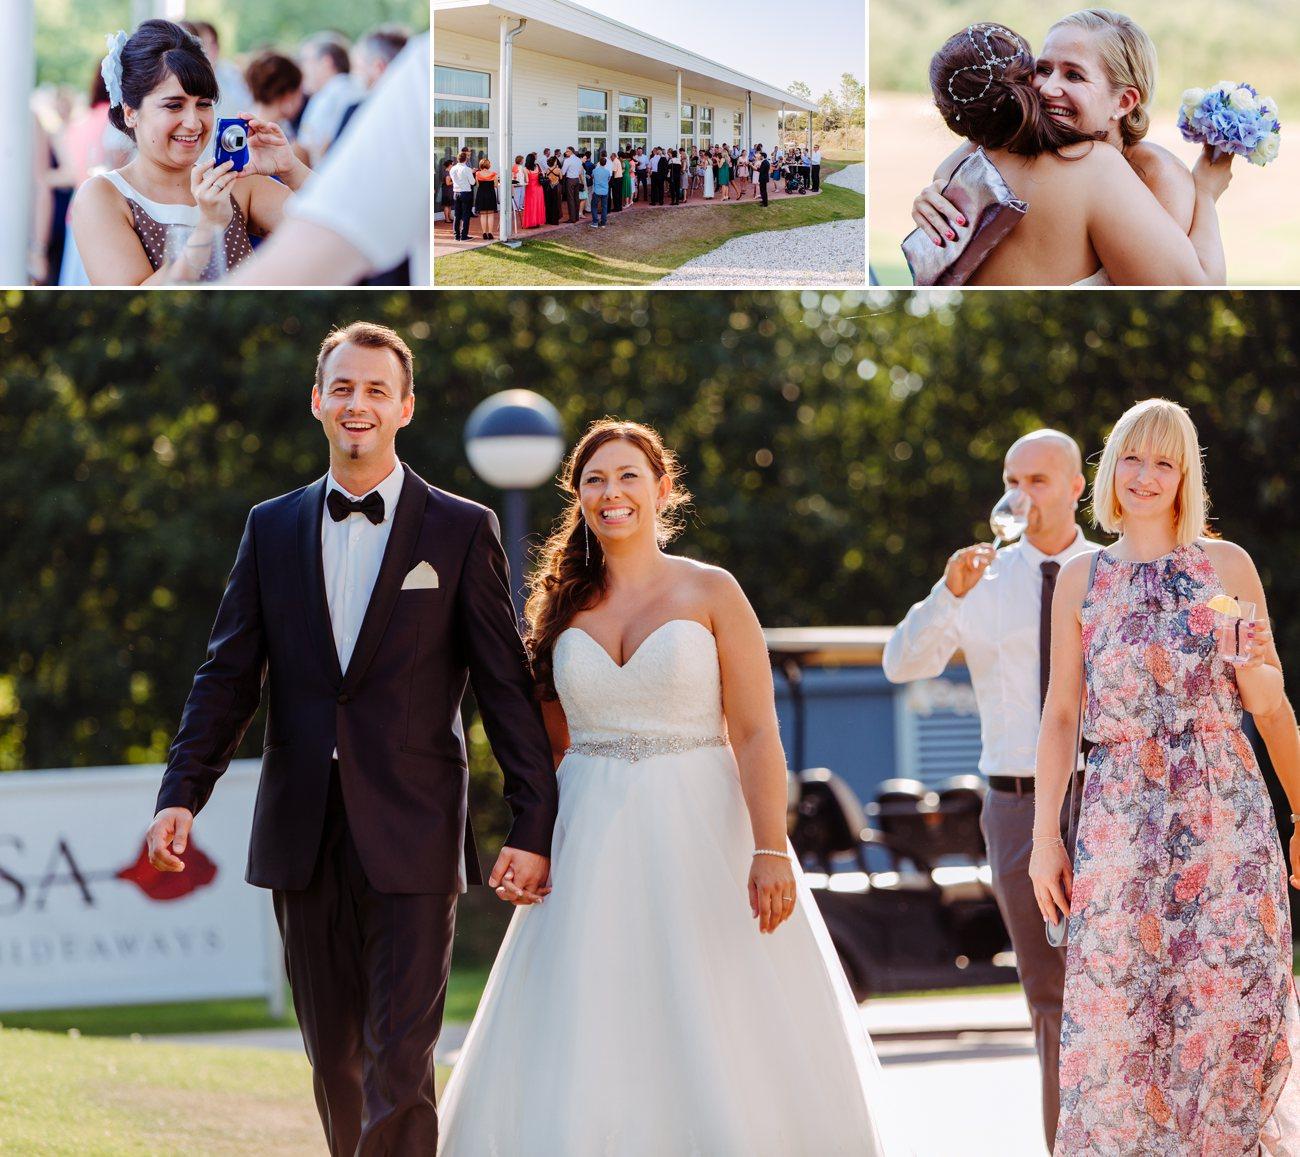 Hochzeitsfotograf_A-Rosa_Scharmuetzelsee079